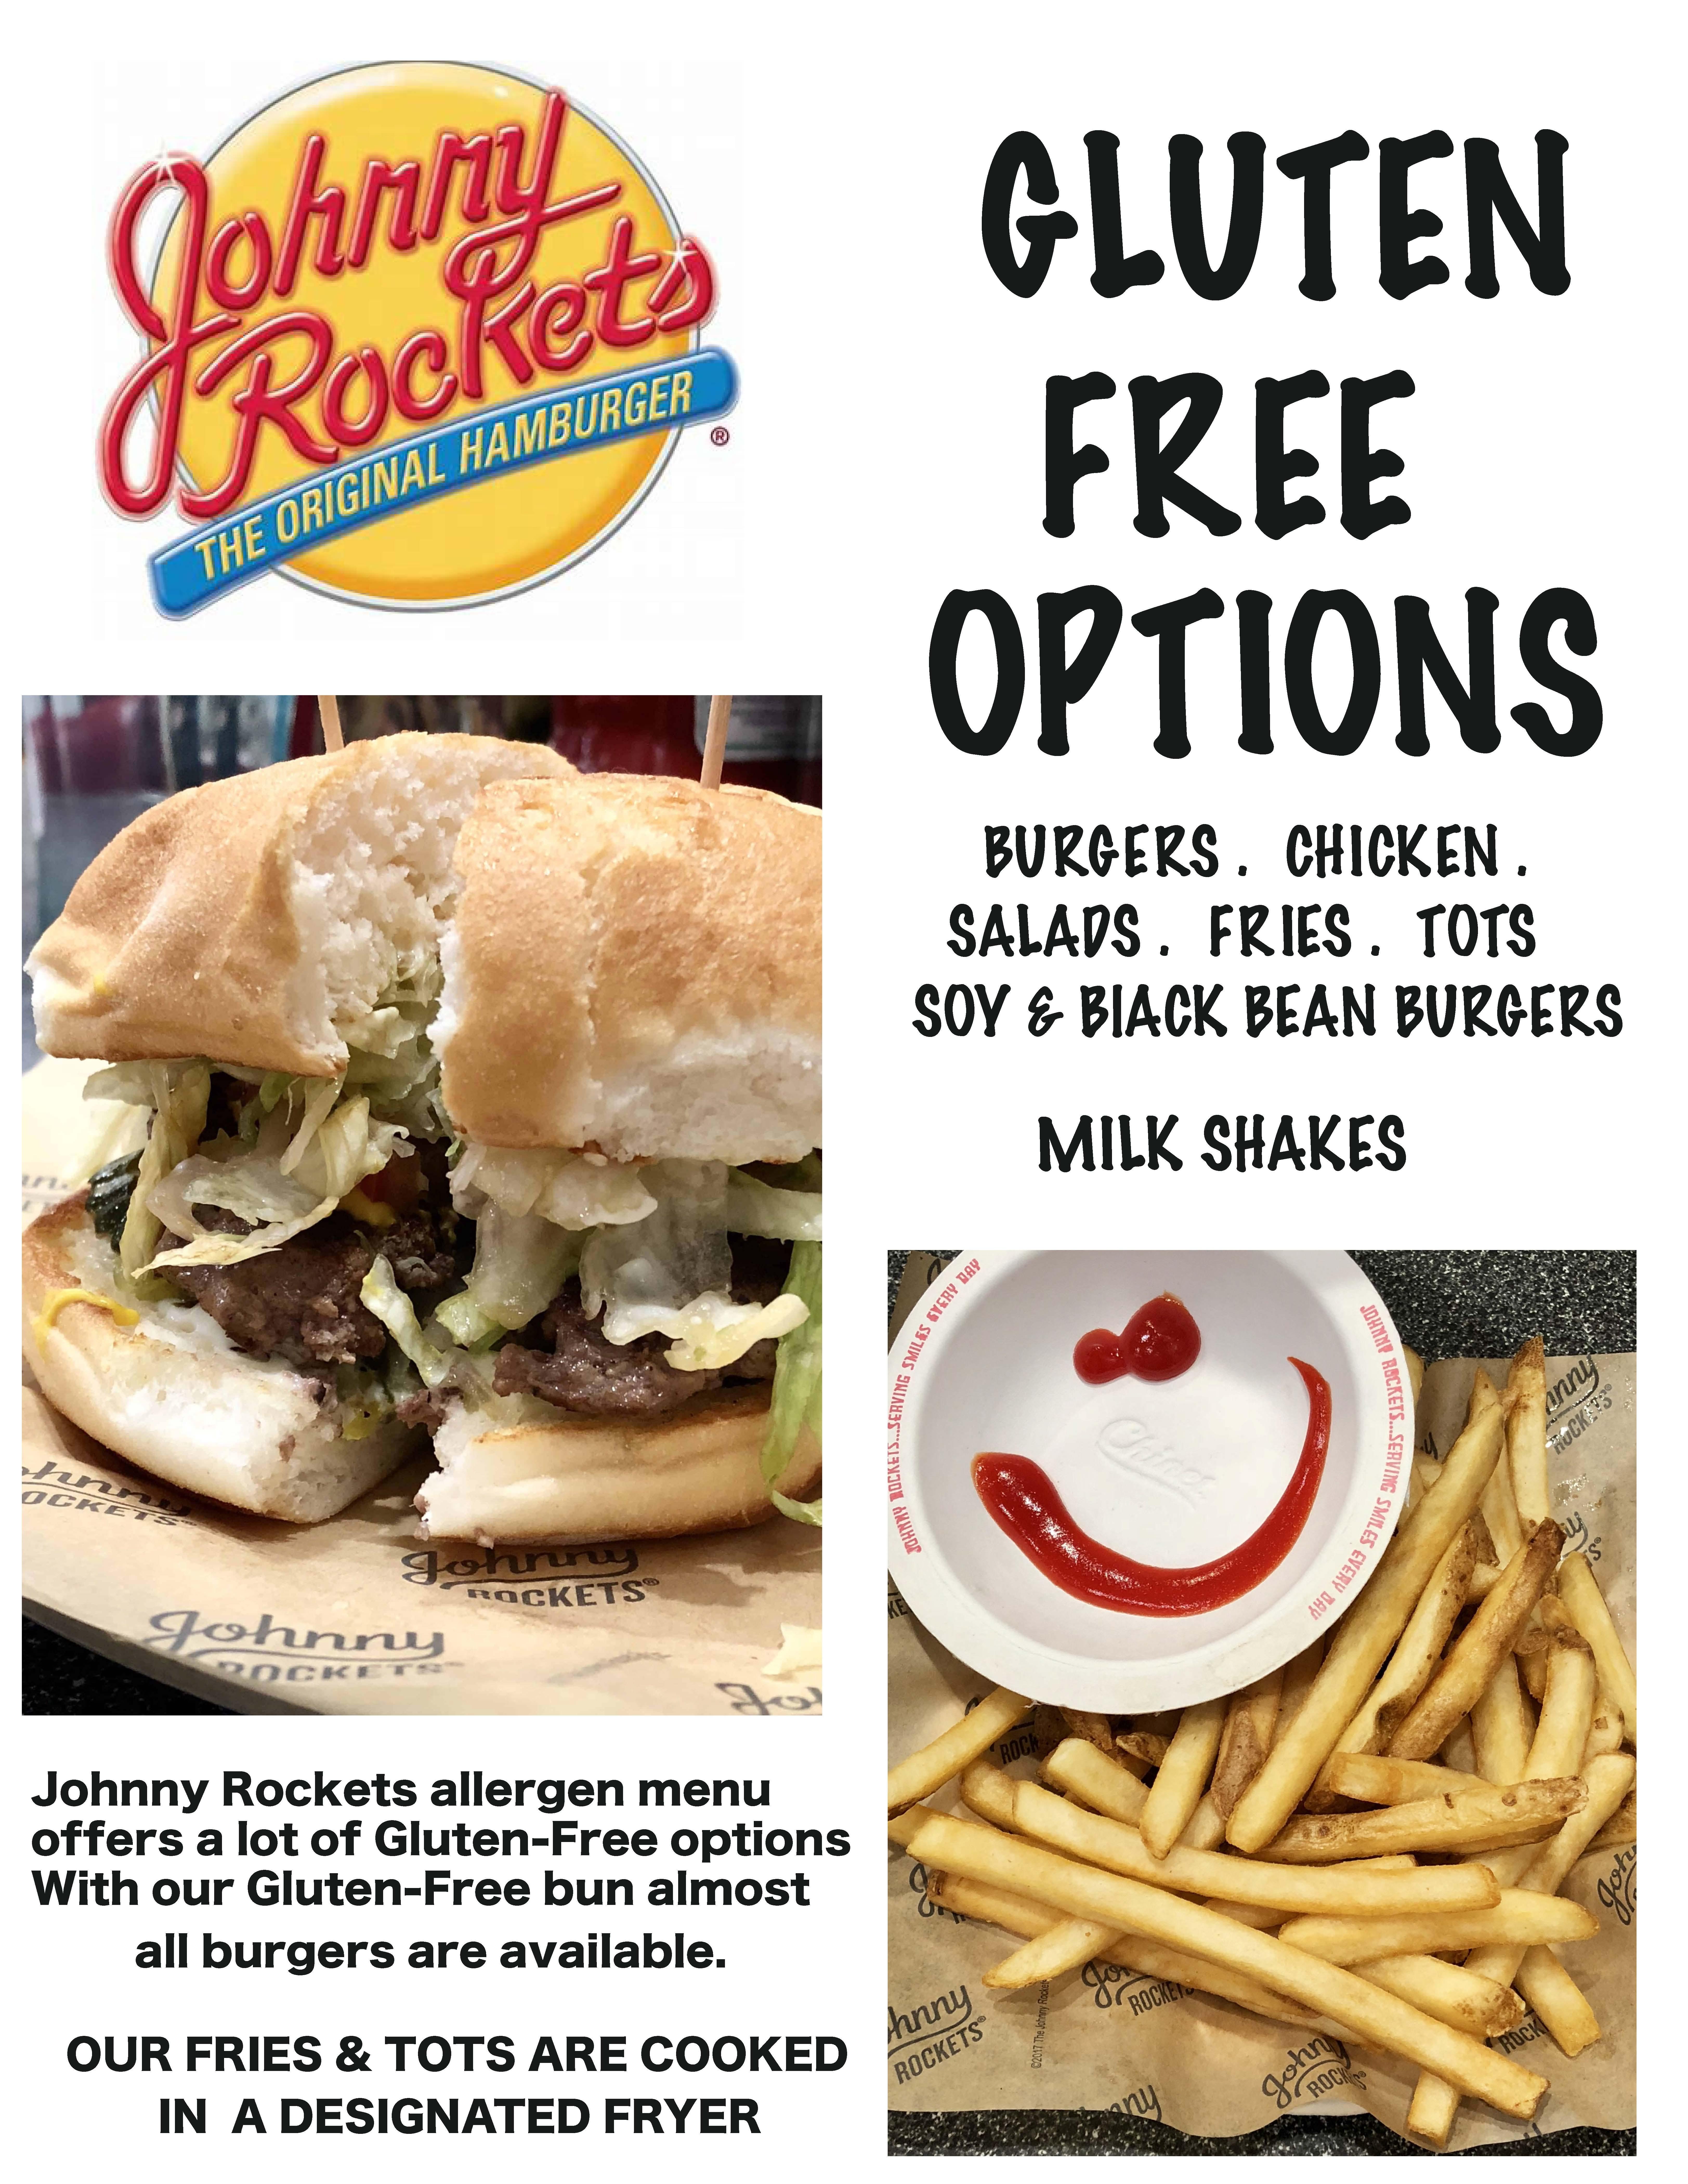 Johnny Rockets GF ROCKETS